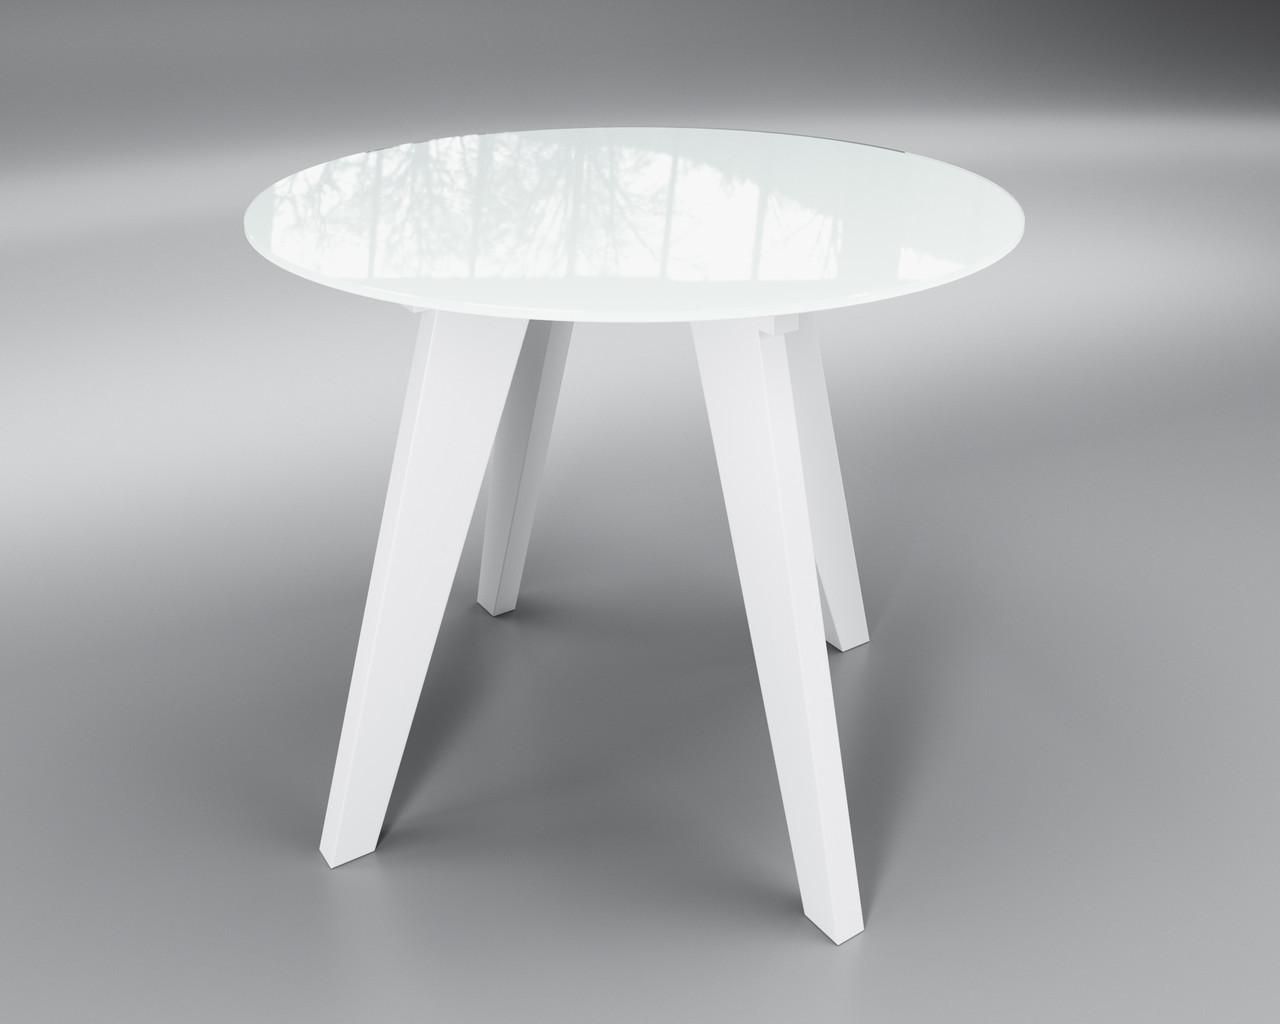 Белый стол стеклянный Леонардо Круг круглый